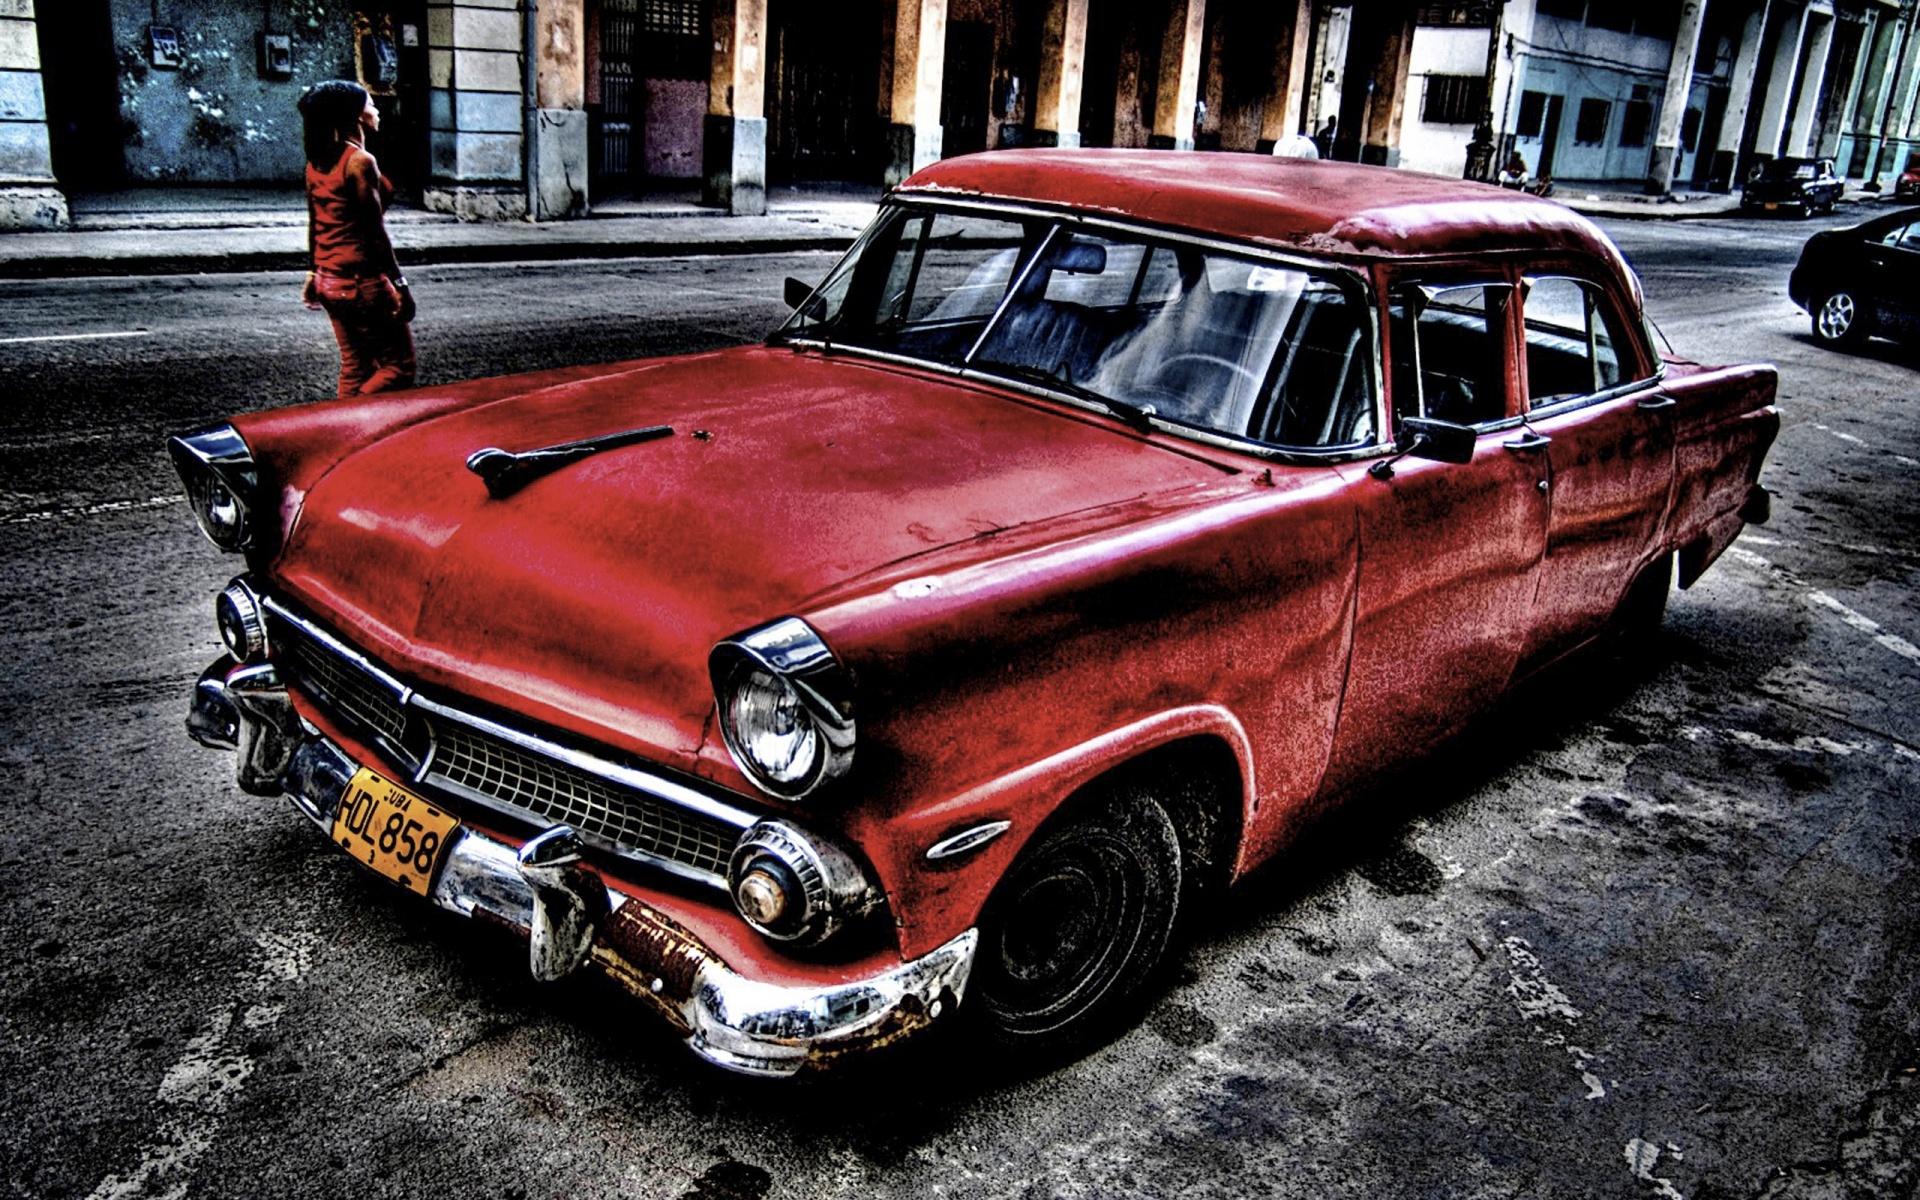 old cars related images start 50 weili automotive network. Black Bedroom Furniture Sets. Home Design Ideas